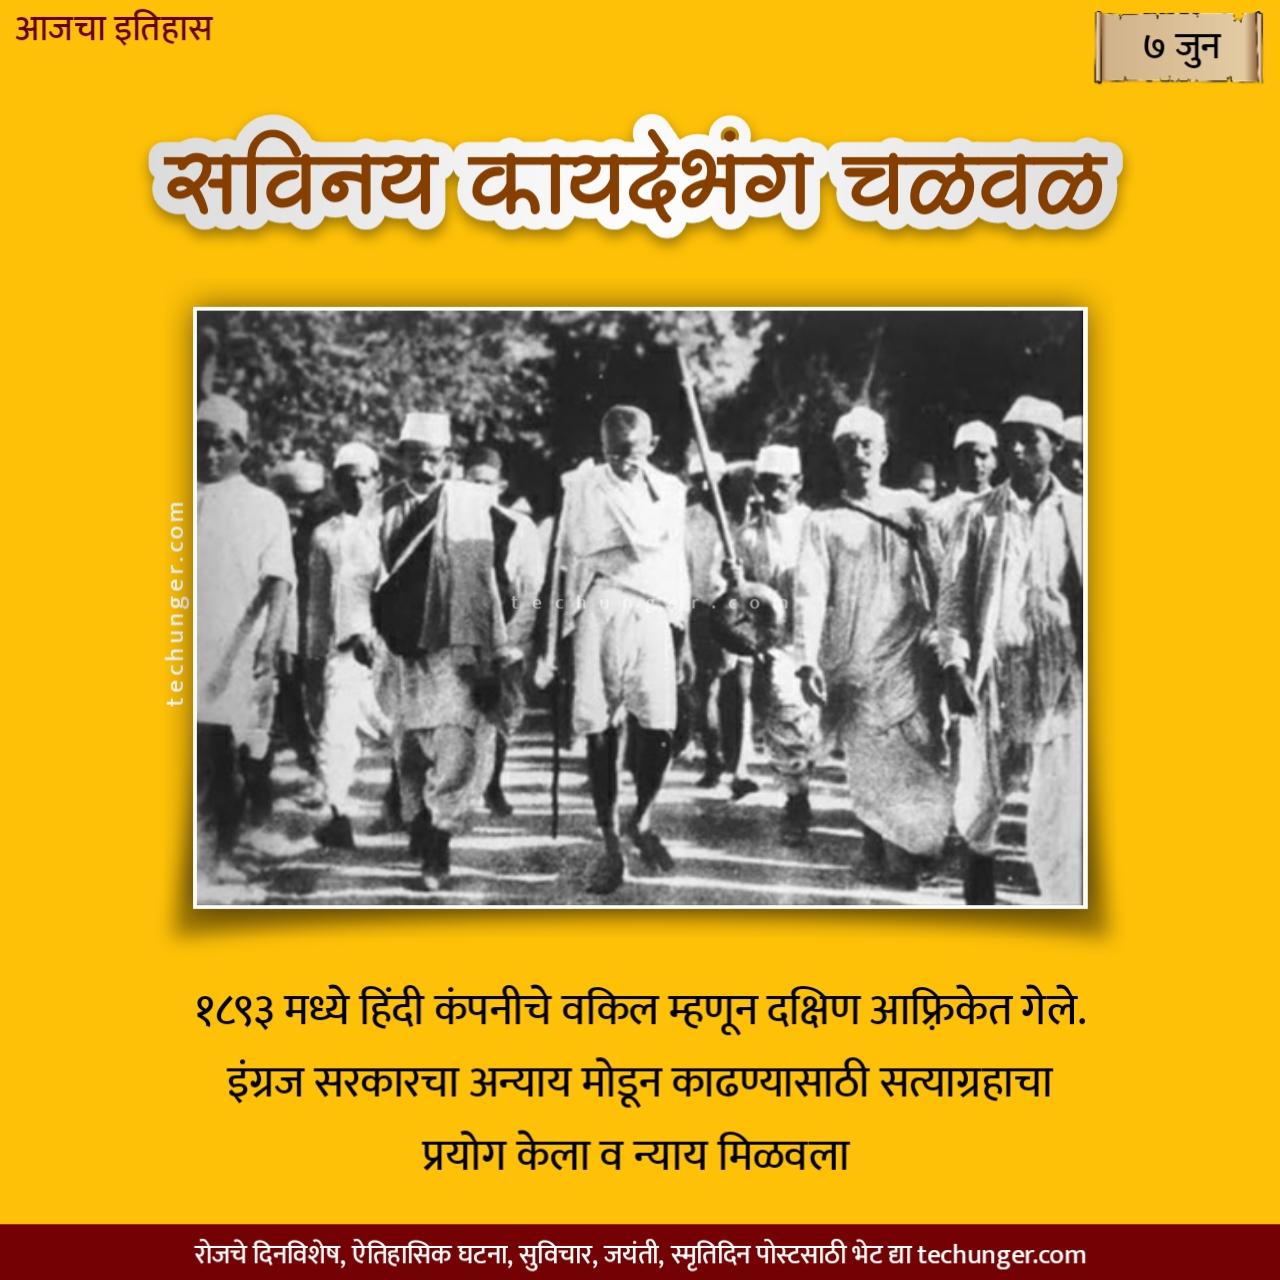 सविनय कायदेभंग चळवळ सुरू, 2021-06-07, 07/06/2021, 7 Jun, 7 Jun 2021, 7 Jun dinvishesh, 7 Jun techunger, ०७/०५/२०२१, ०७ जून दिनविशेष, ०७ जून घटना, ७ जून जन्मदिन, ७ जून स्मृतिदिन, ७ जून इतिहास, techunger, Saurabh Chaudhari, marathi quotes, hindi quotes